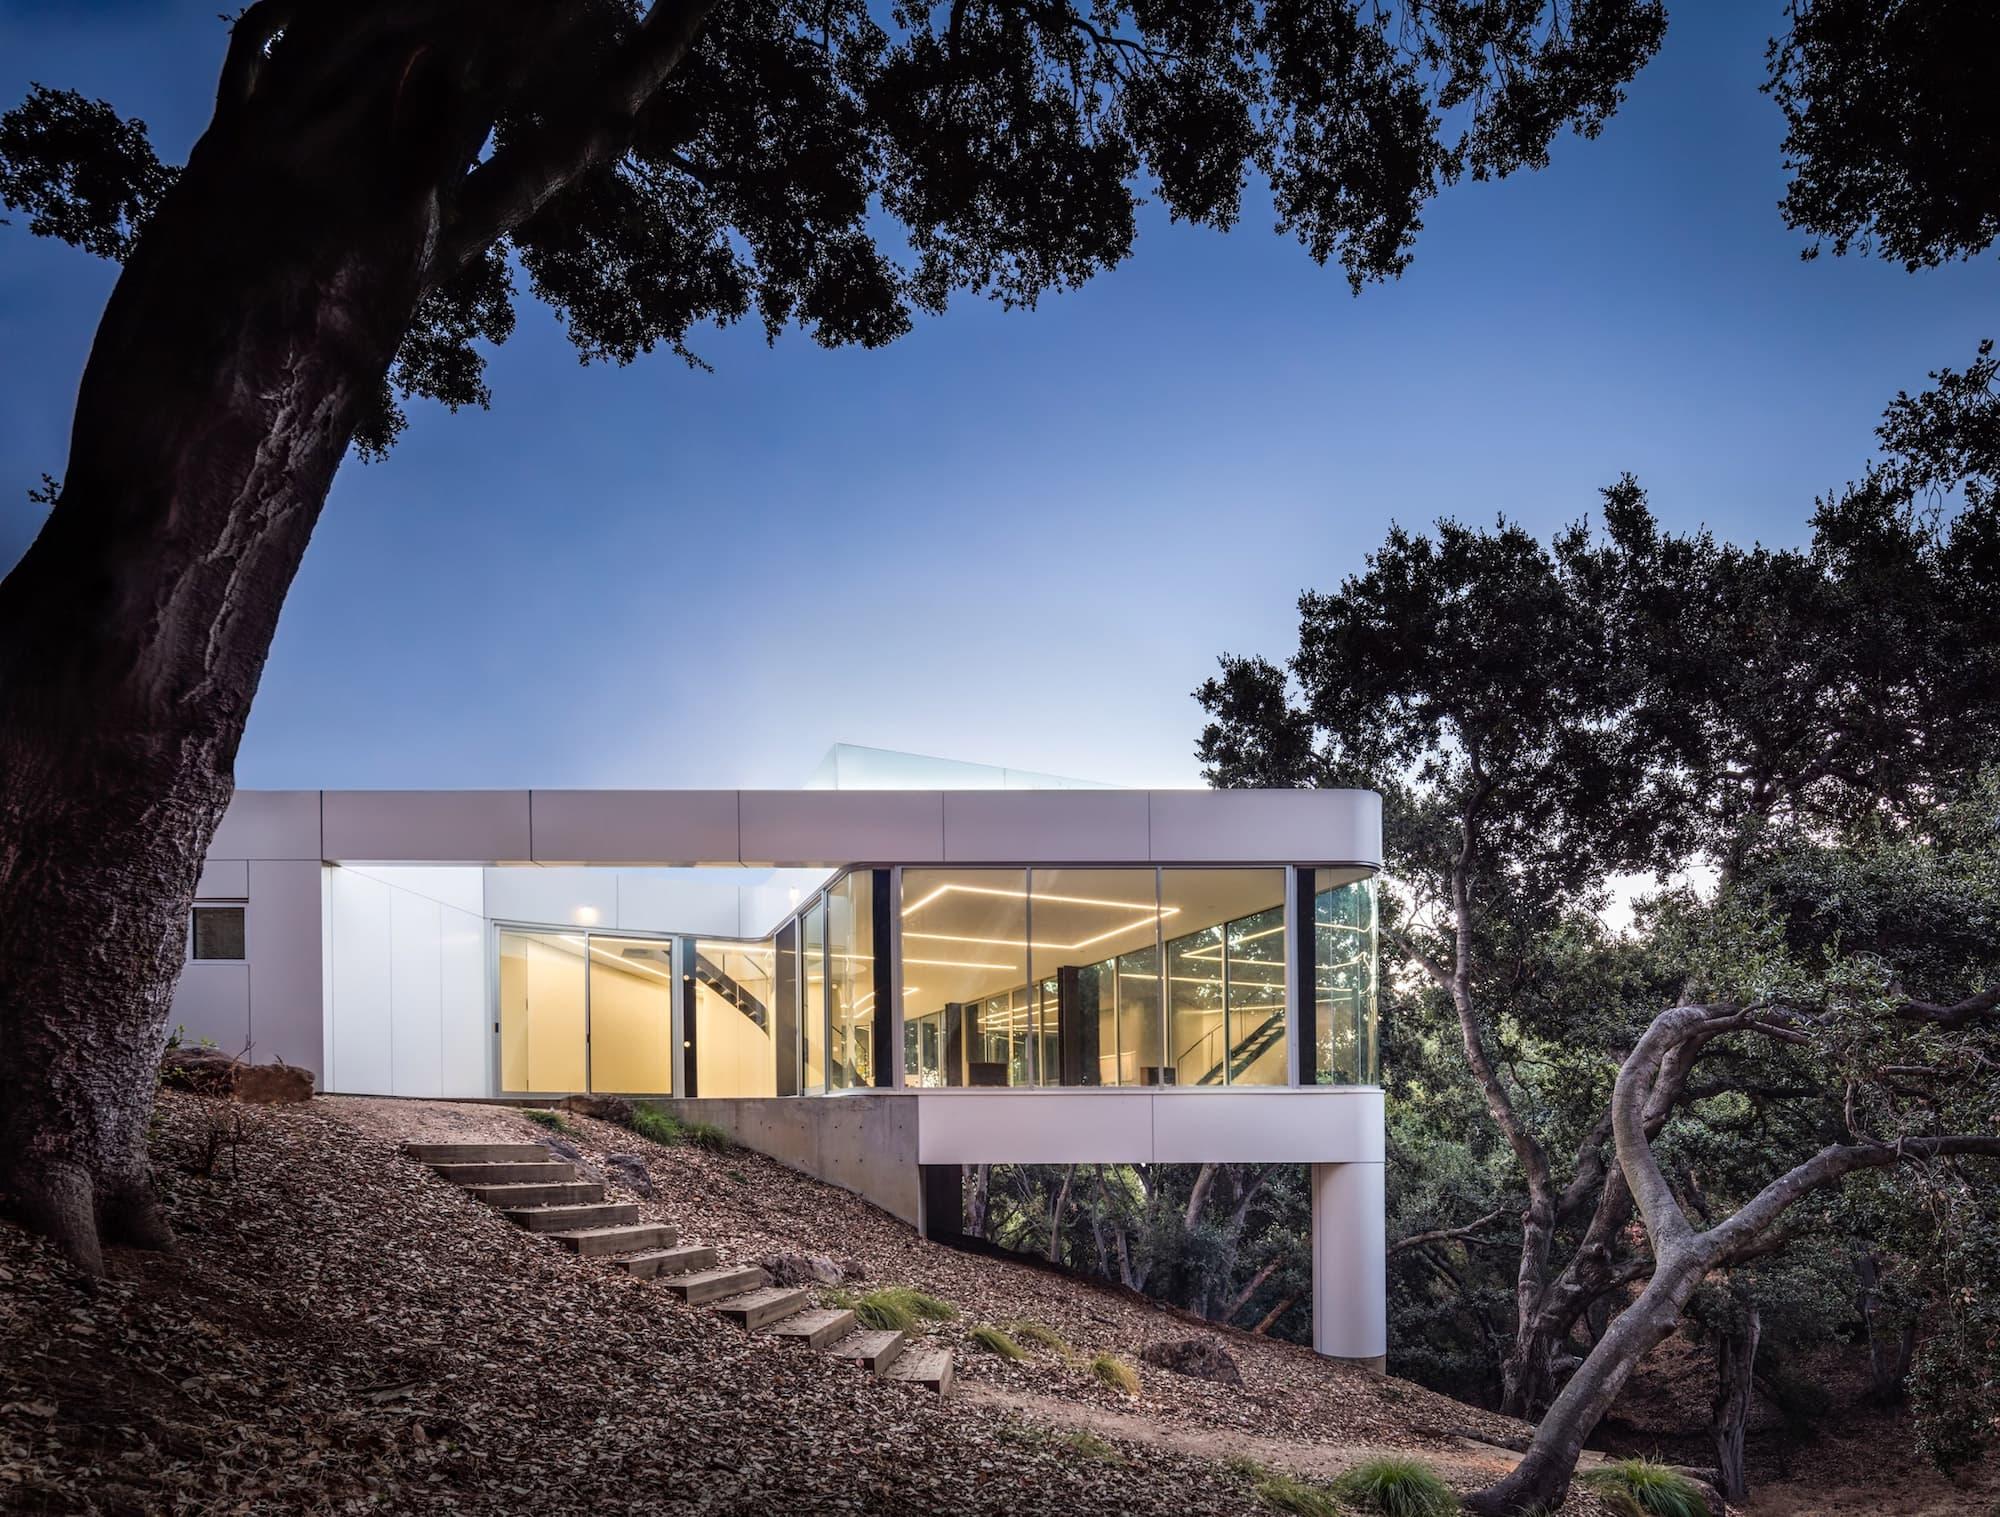 Licht ist Leben: Pam & Paul's House by Craig Steely Architecture 1